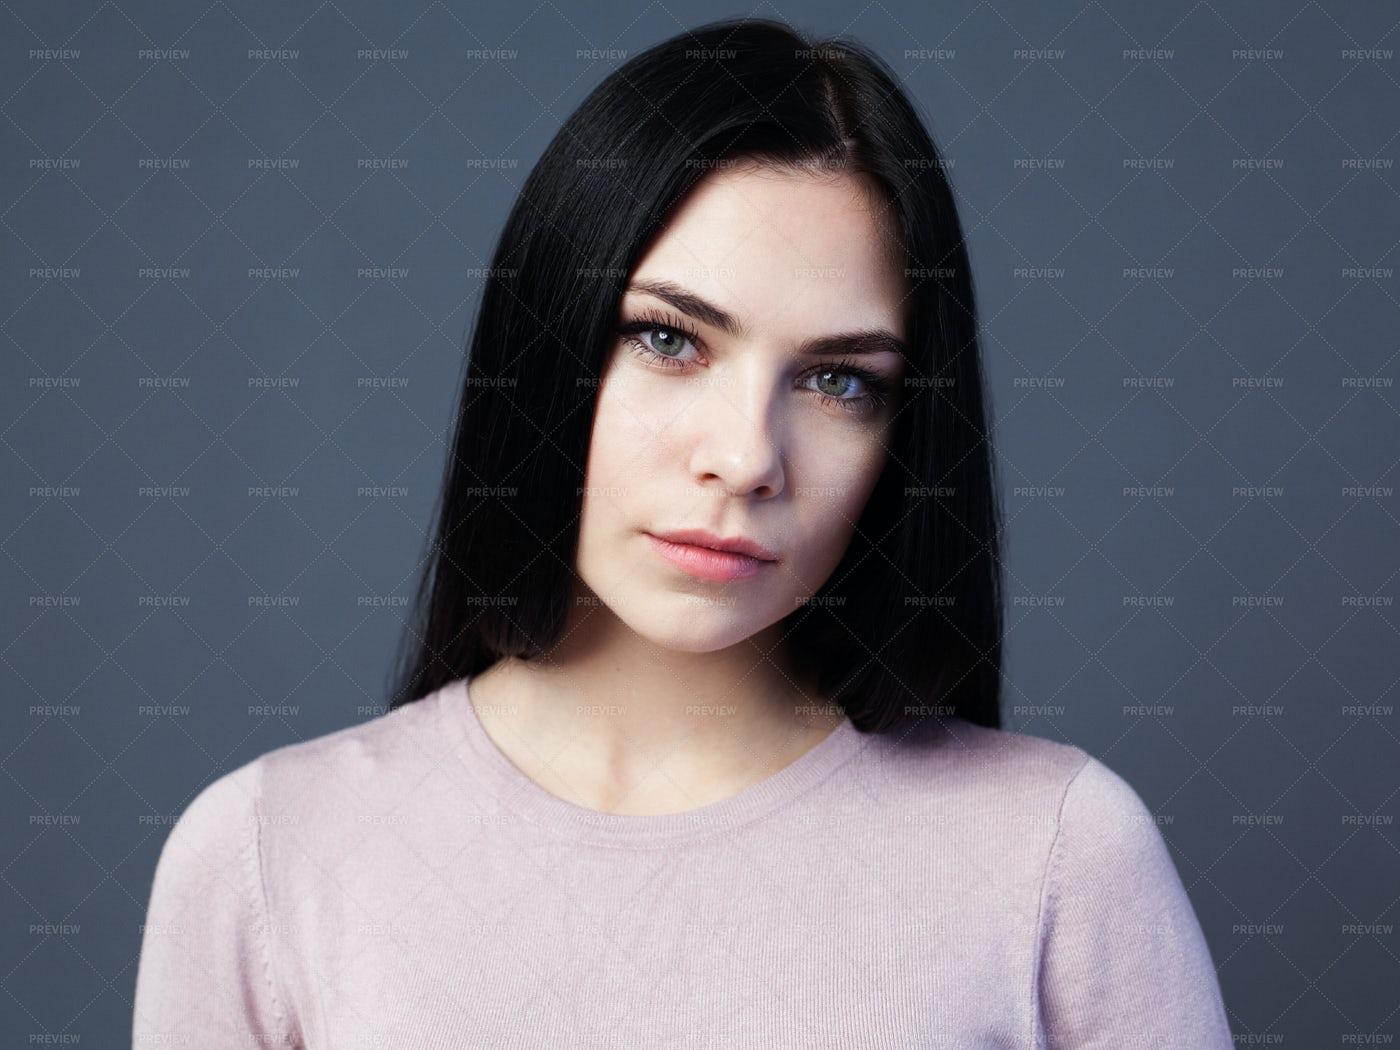 Woman With Black Hair: Stock Photos